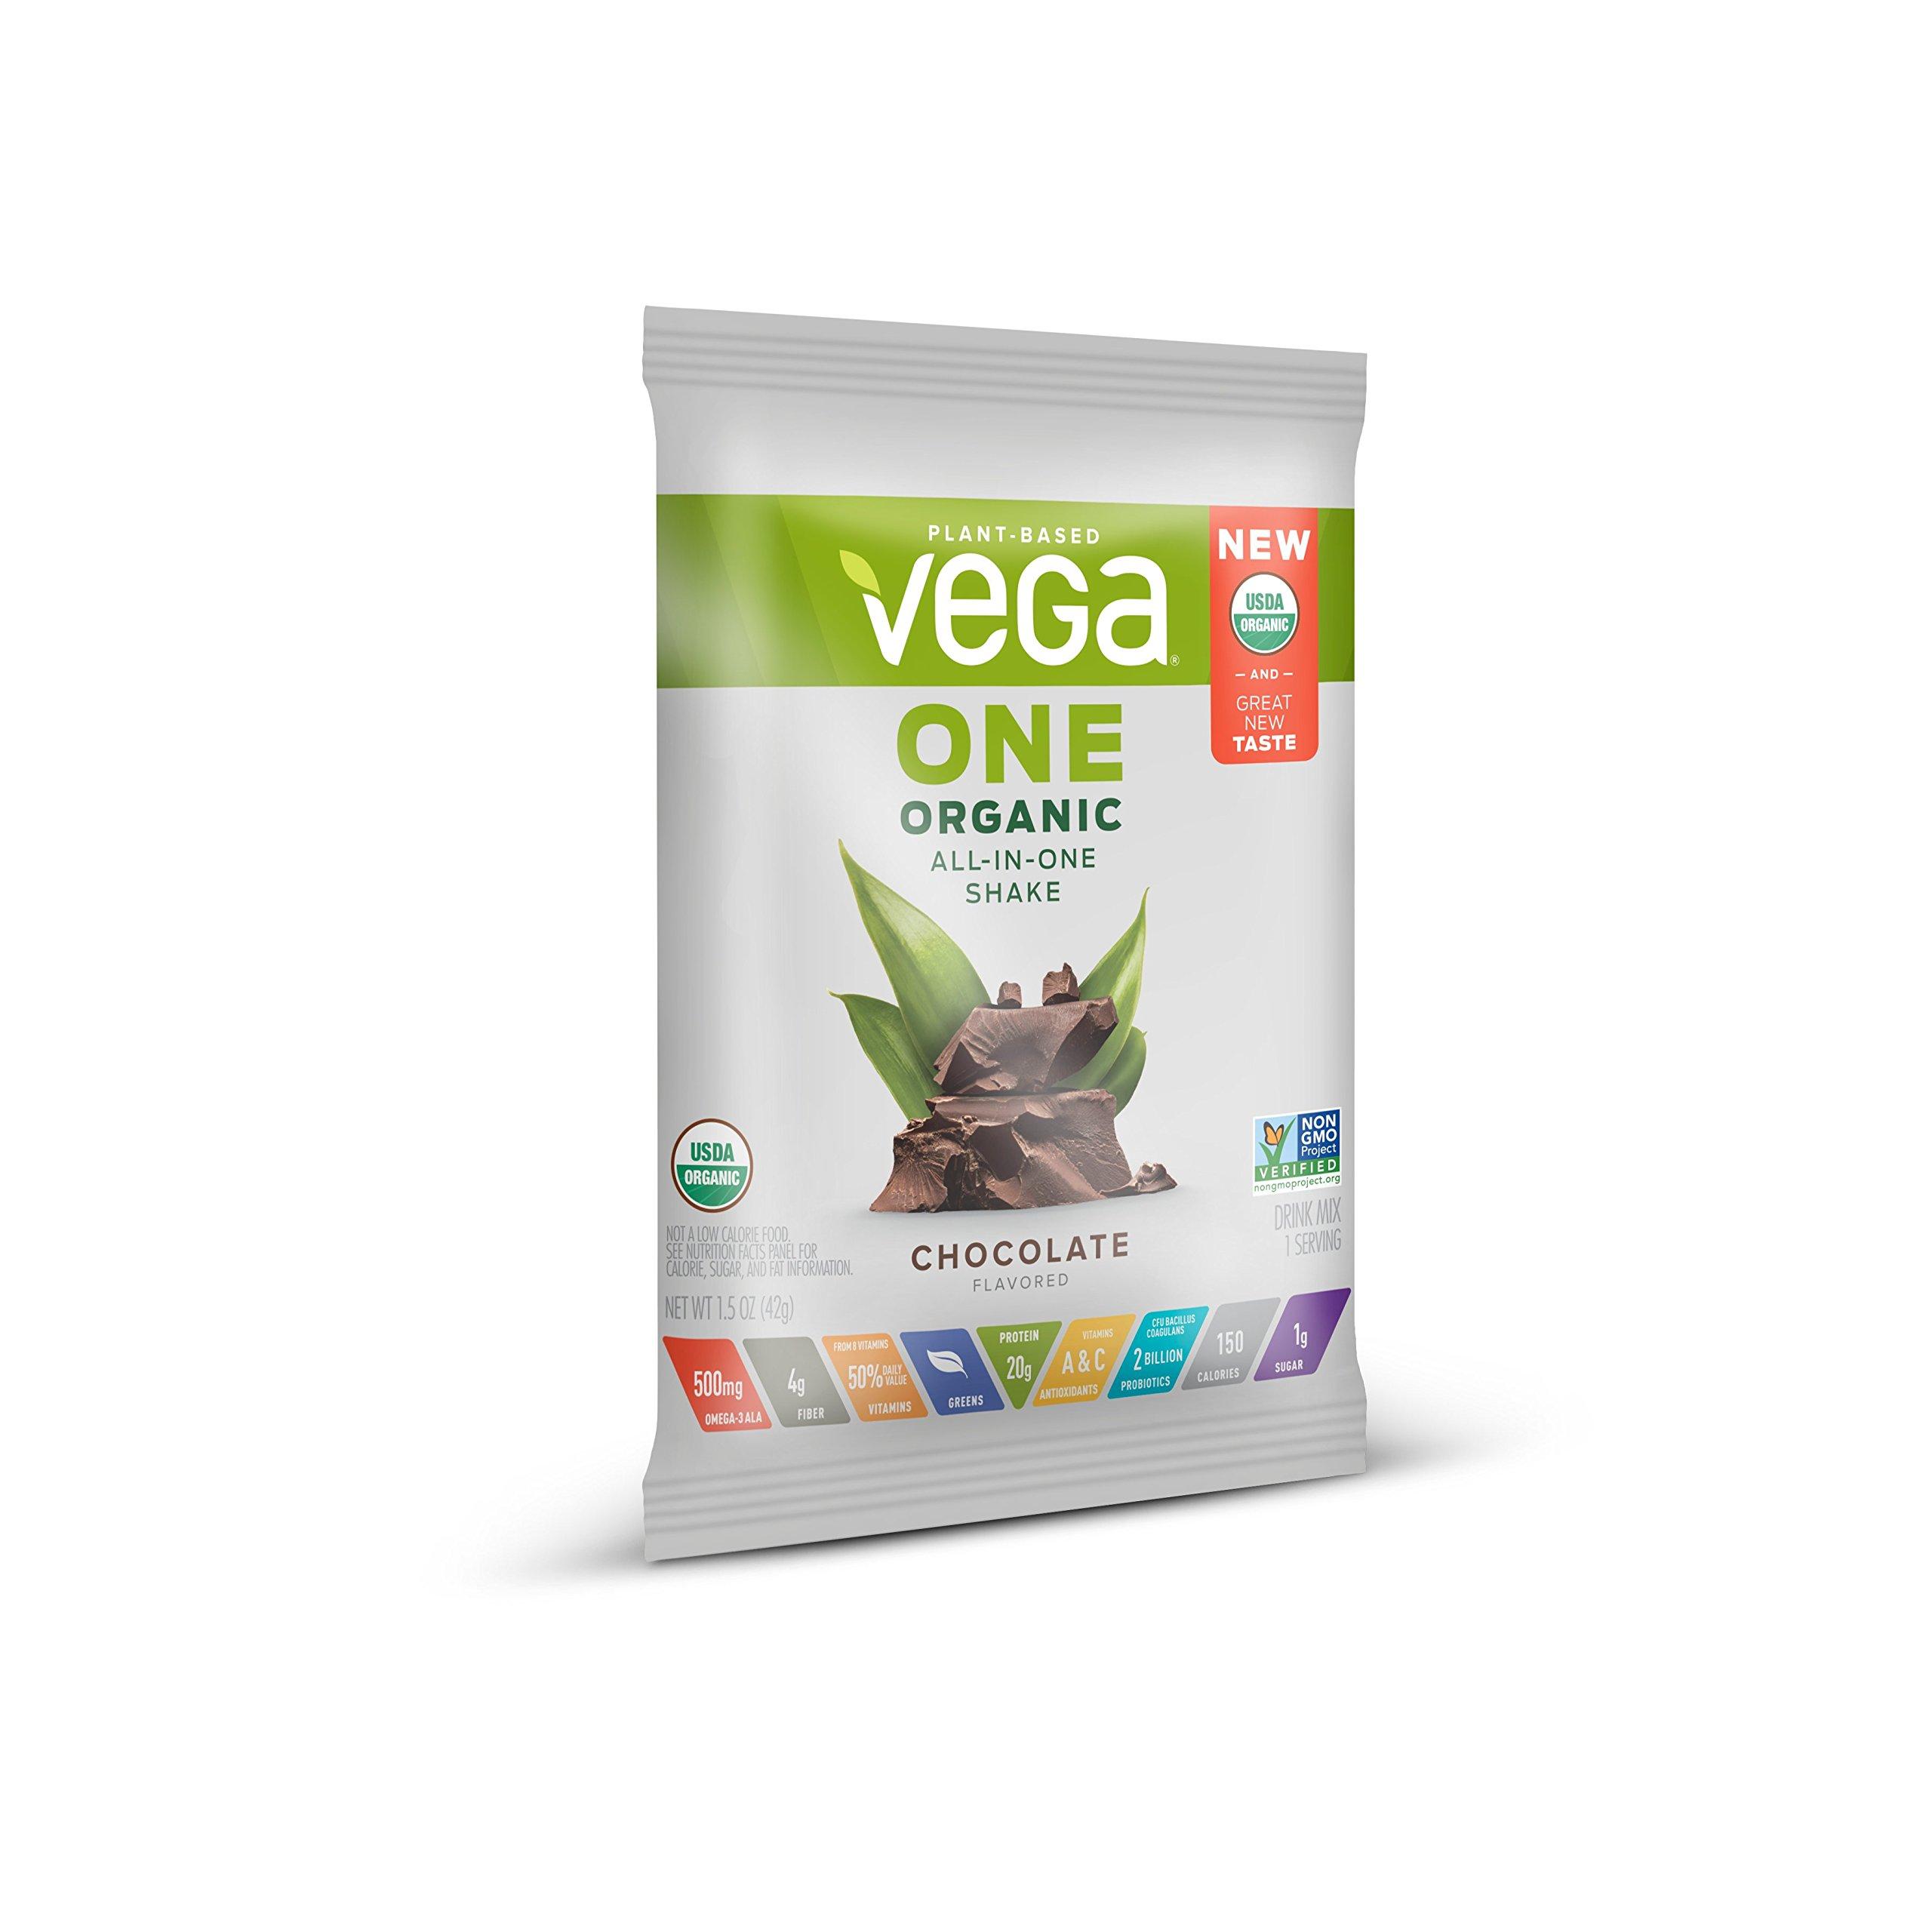 Vega One Organic Plant Protein Powder, Chocolate, 1.5 Ounce